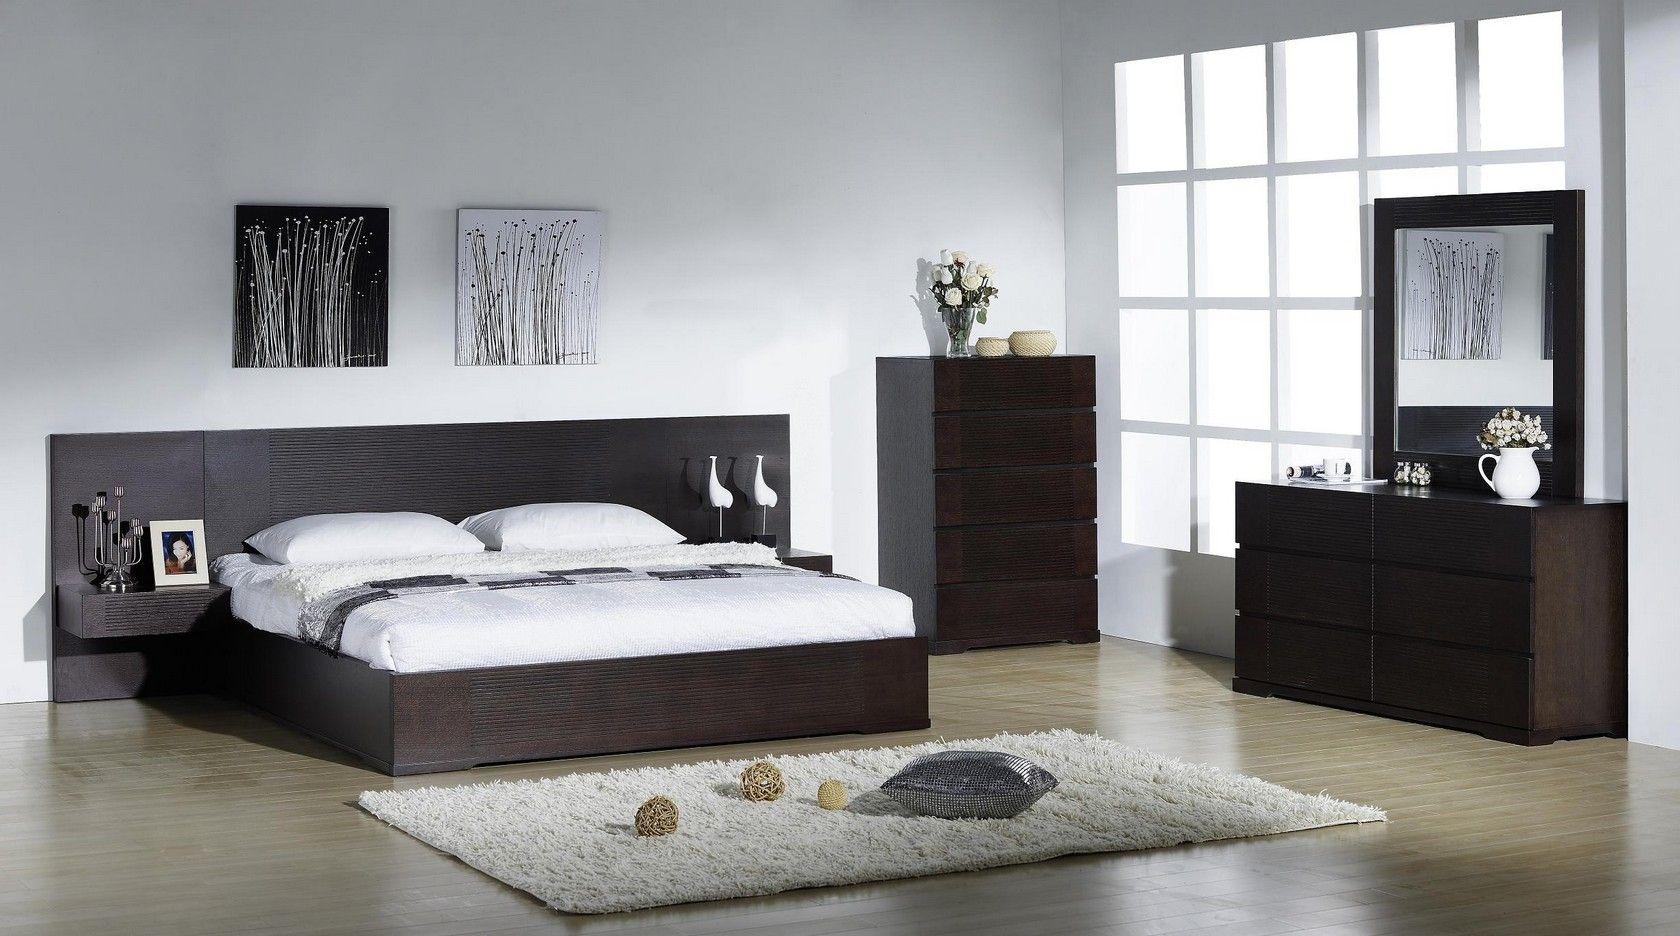 1000  images about Bedroom Sets on Pinterest   Platform bedroom  Office furniture and Bedroom sets. 1000  images about Bedroom Sets on Pinterest   Platform bedroom